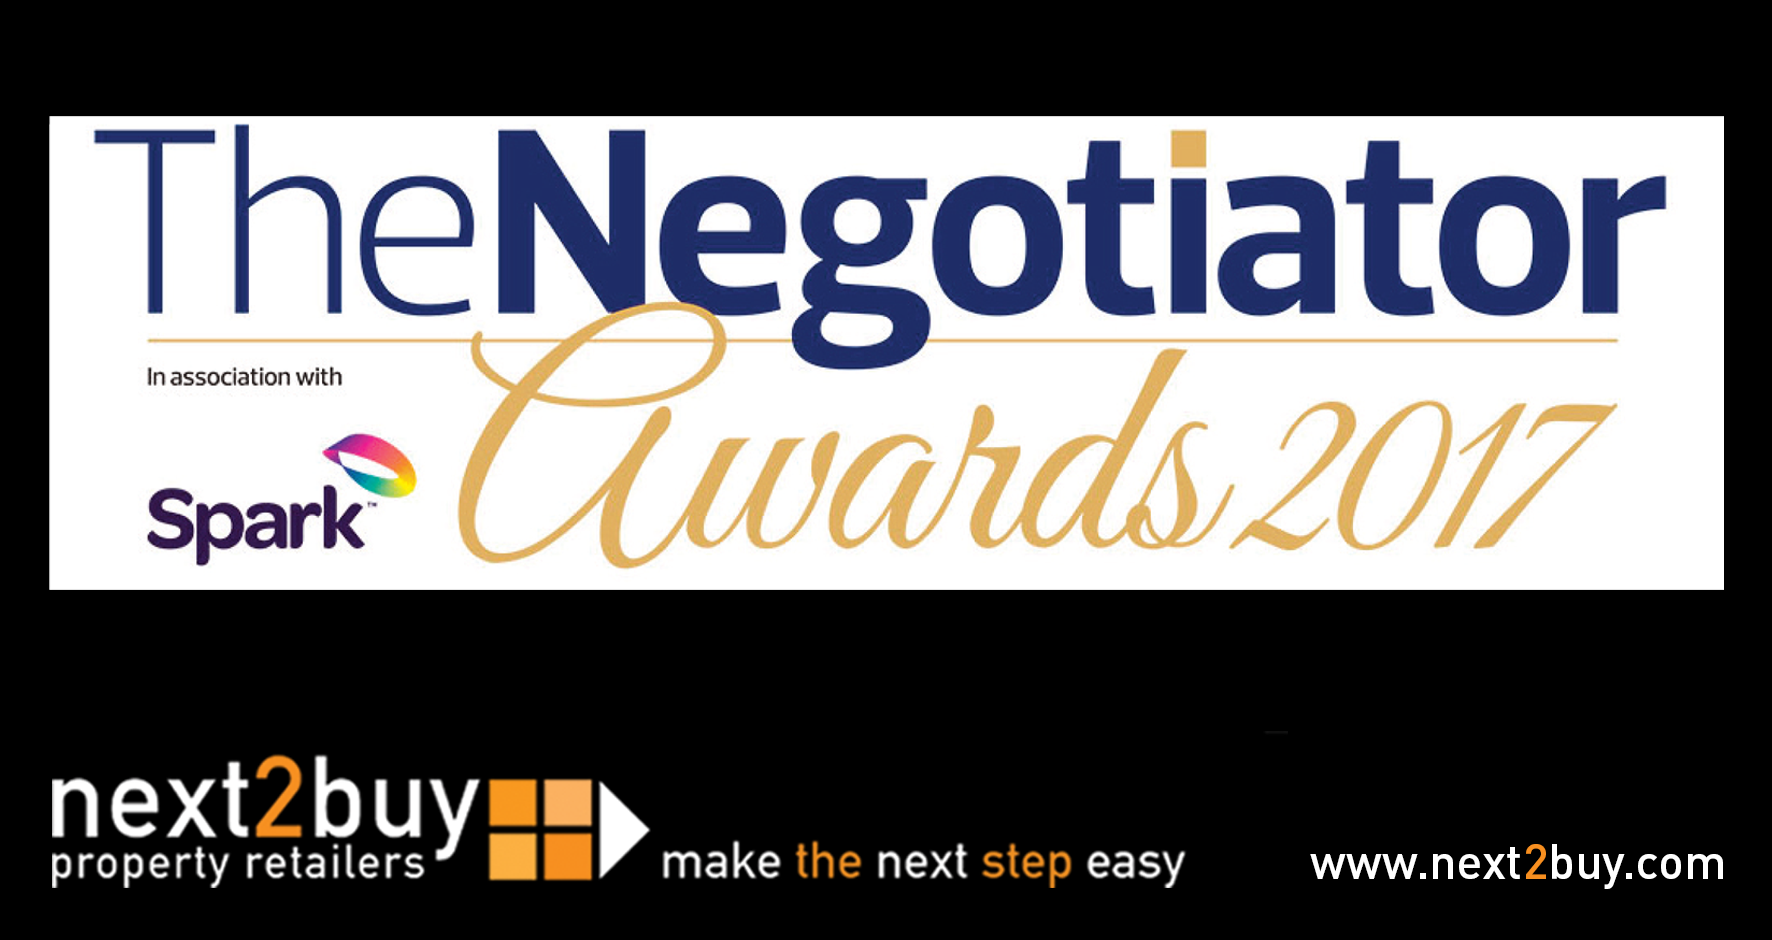 Negotiator Awards 2017